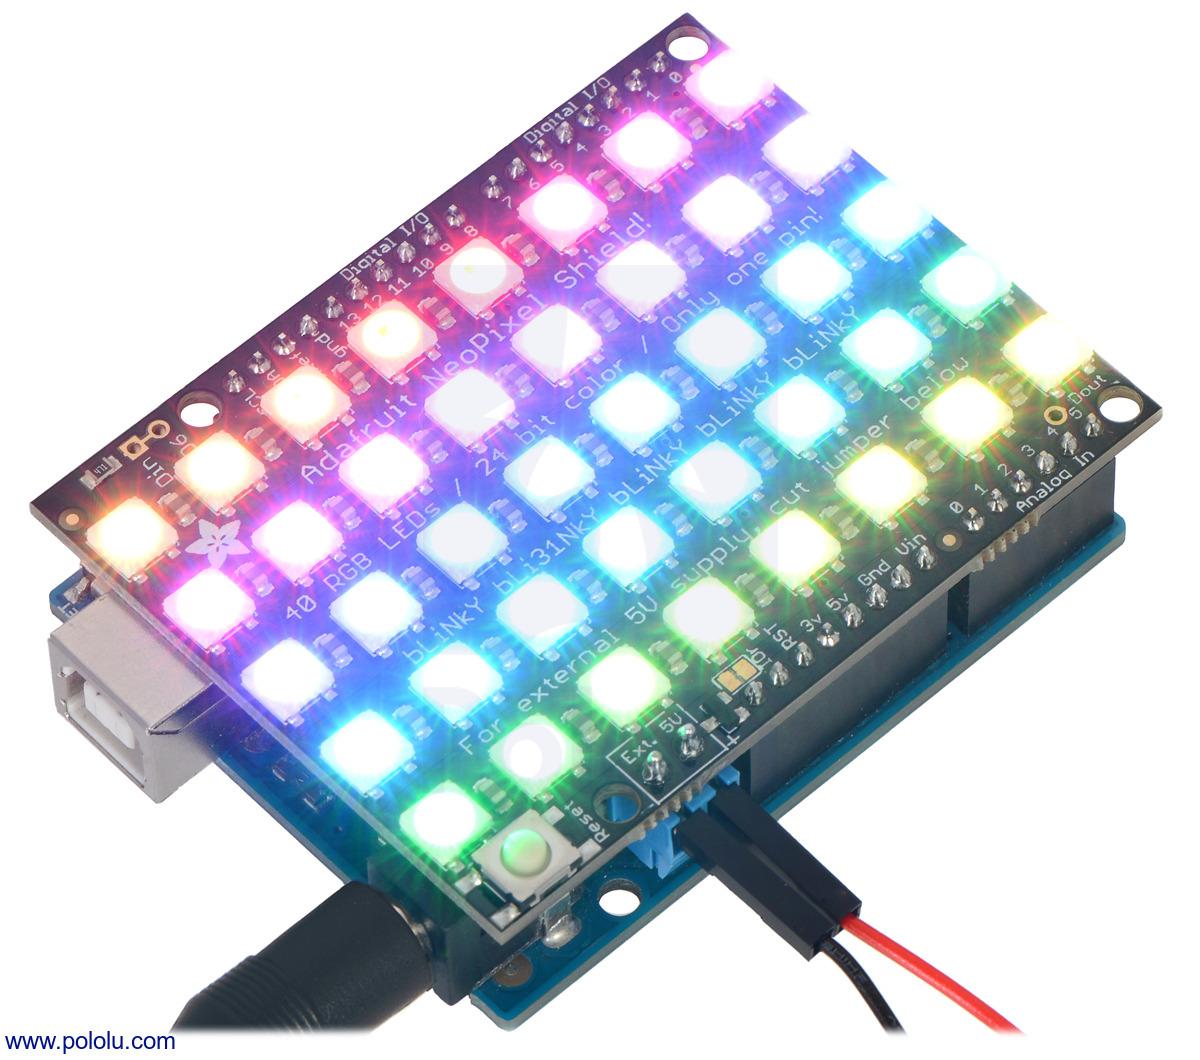 Pololu - Adafruit NeoPixel Shield for Arduino - 40 RGB LED Pixel Matrix